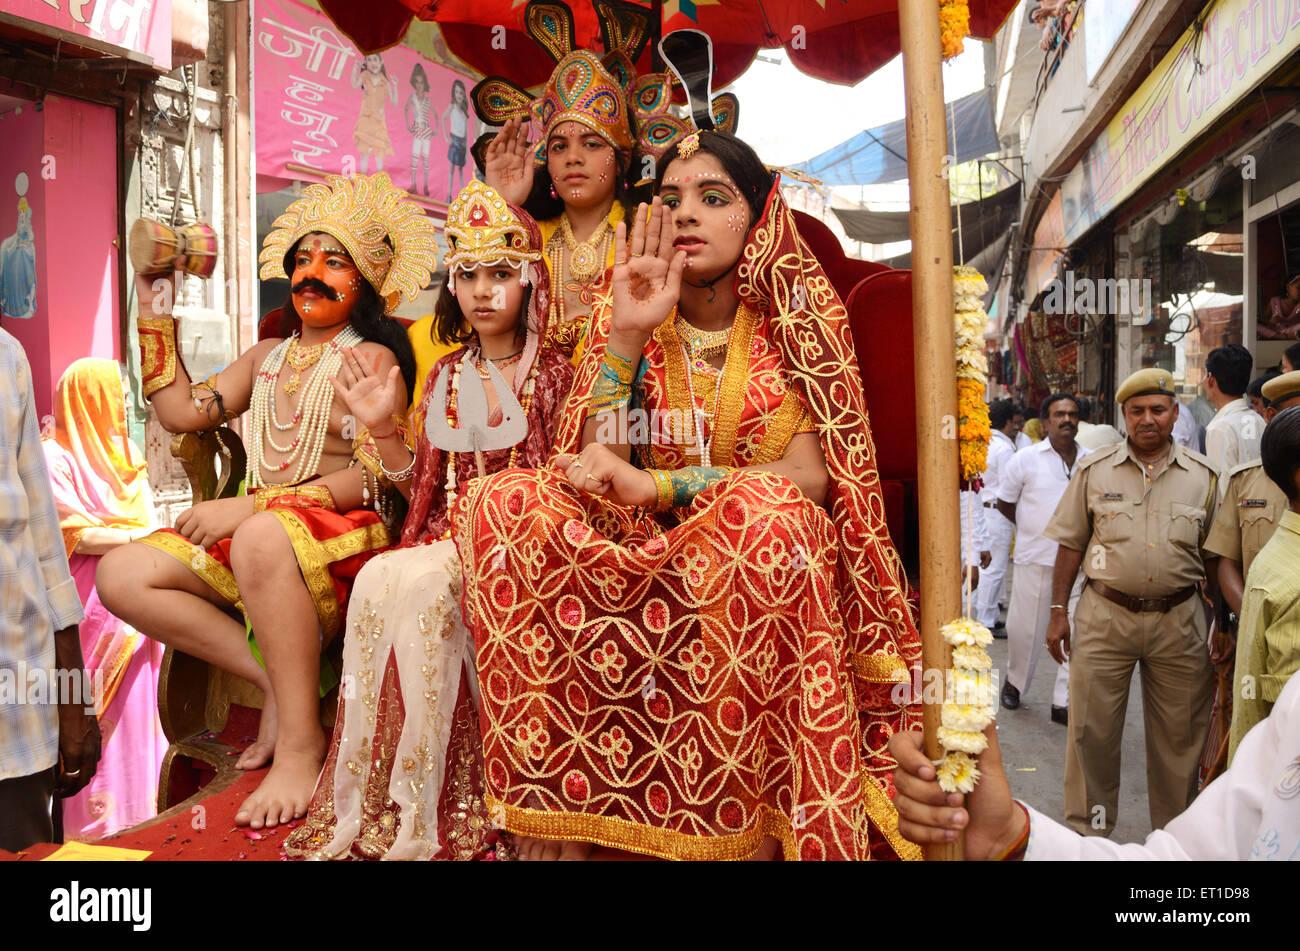 Girls in disguise of jain mythological characters in procession of Mahavir Jayanti Jodhpur Rajasthan India NO MR - Stock Image